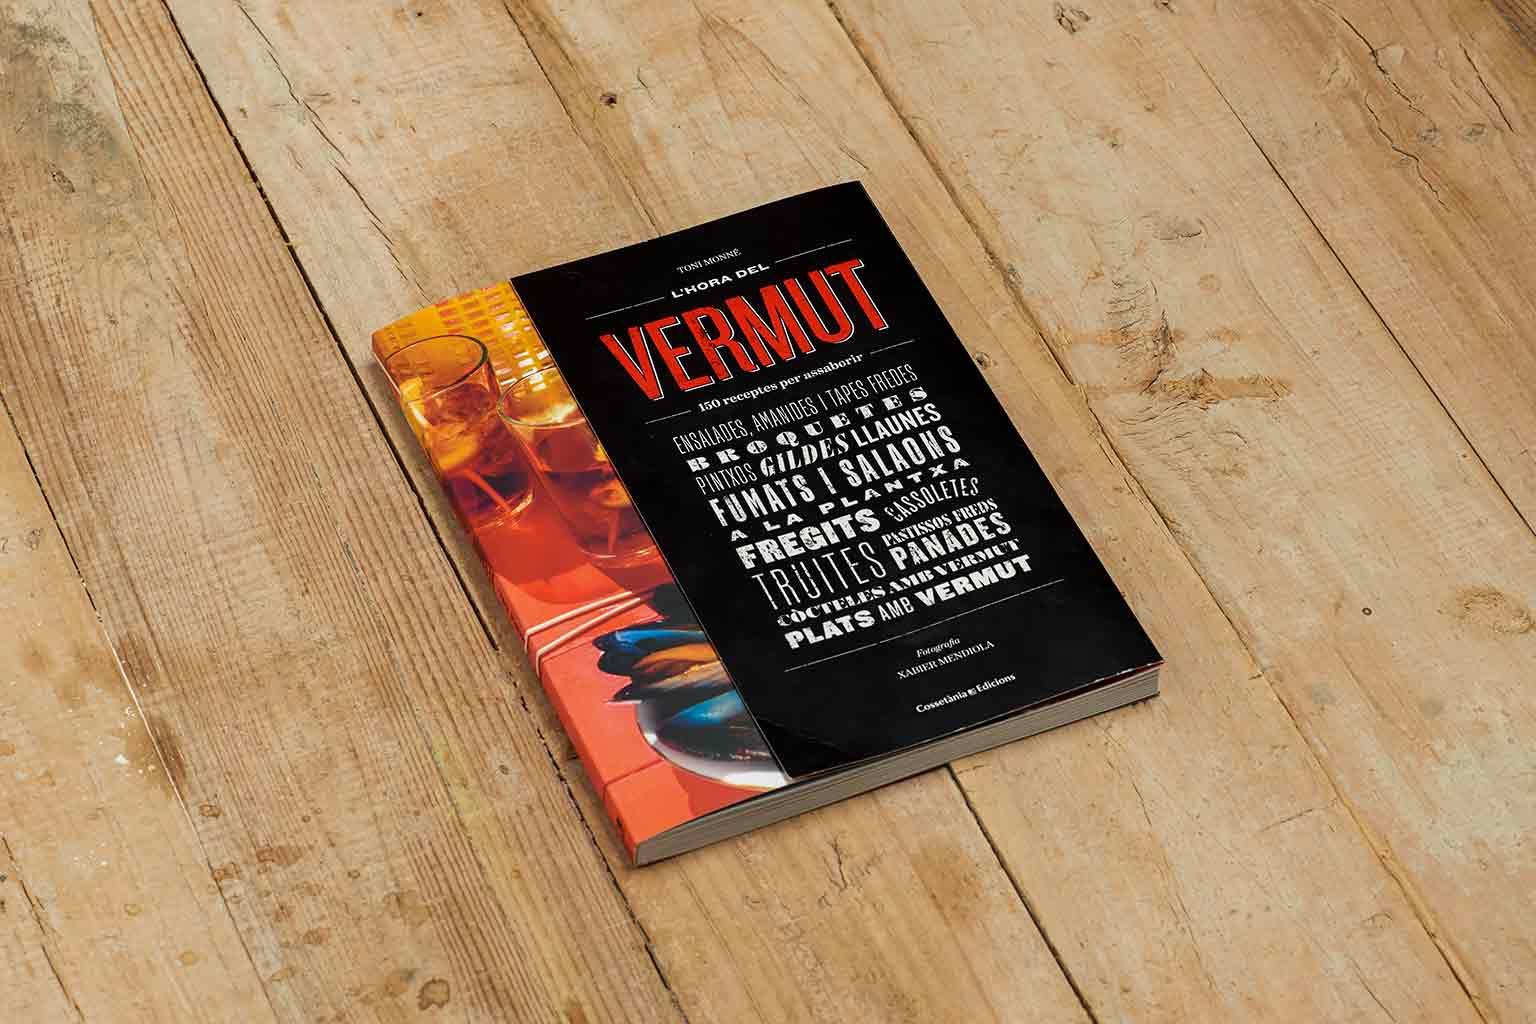 forfood-libro-vermut-editorial-gastronomia-food-stylist-fotografia